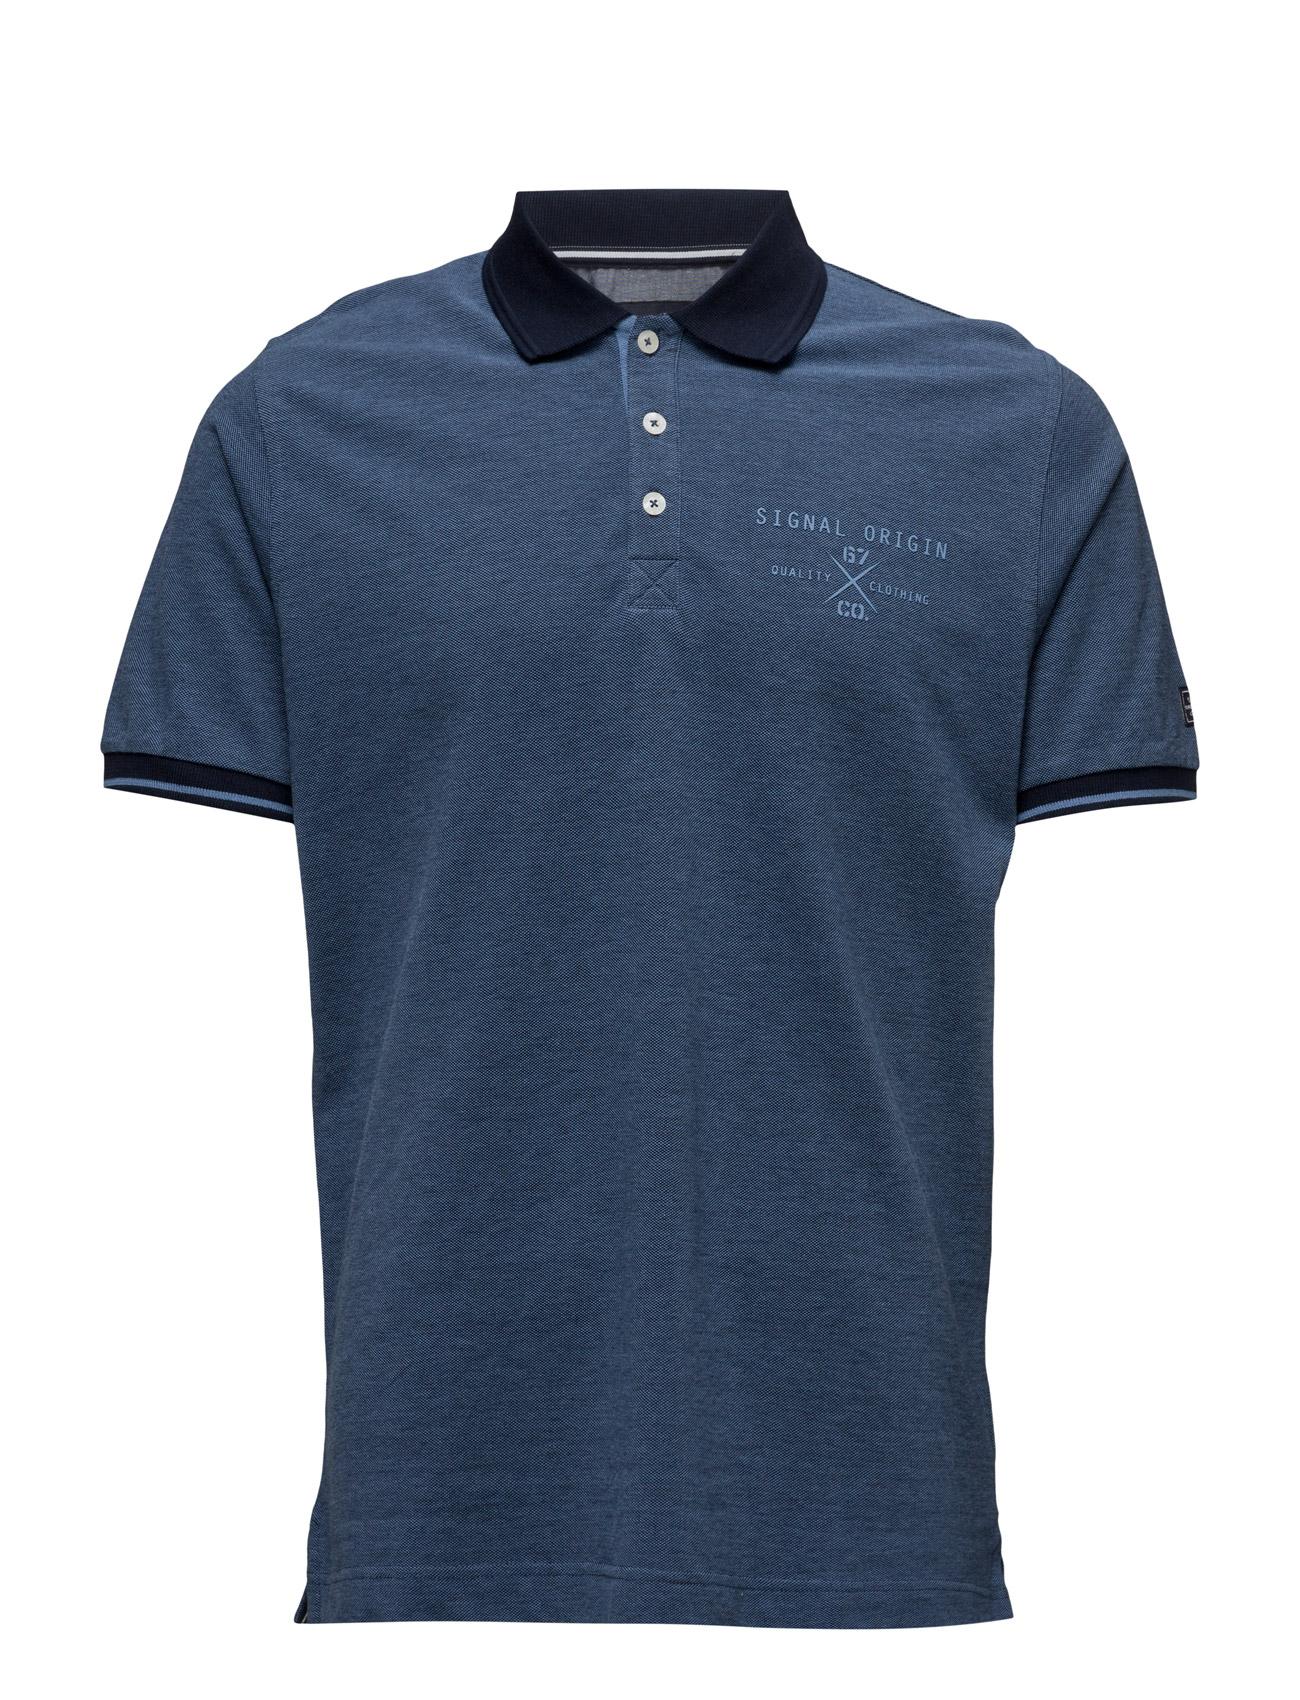 Nixon Signal Kortærmede polo t-shirts til Herrer i Duke Blå